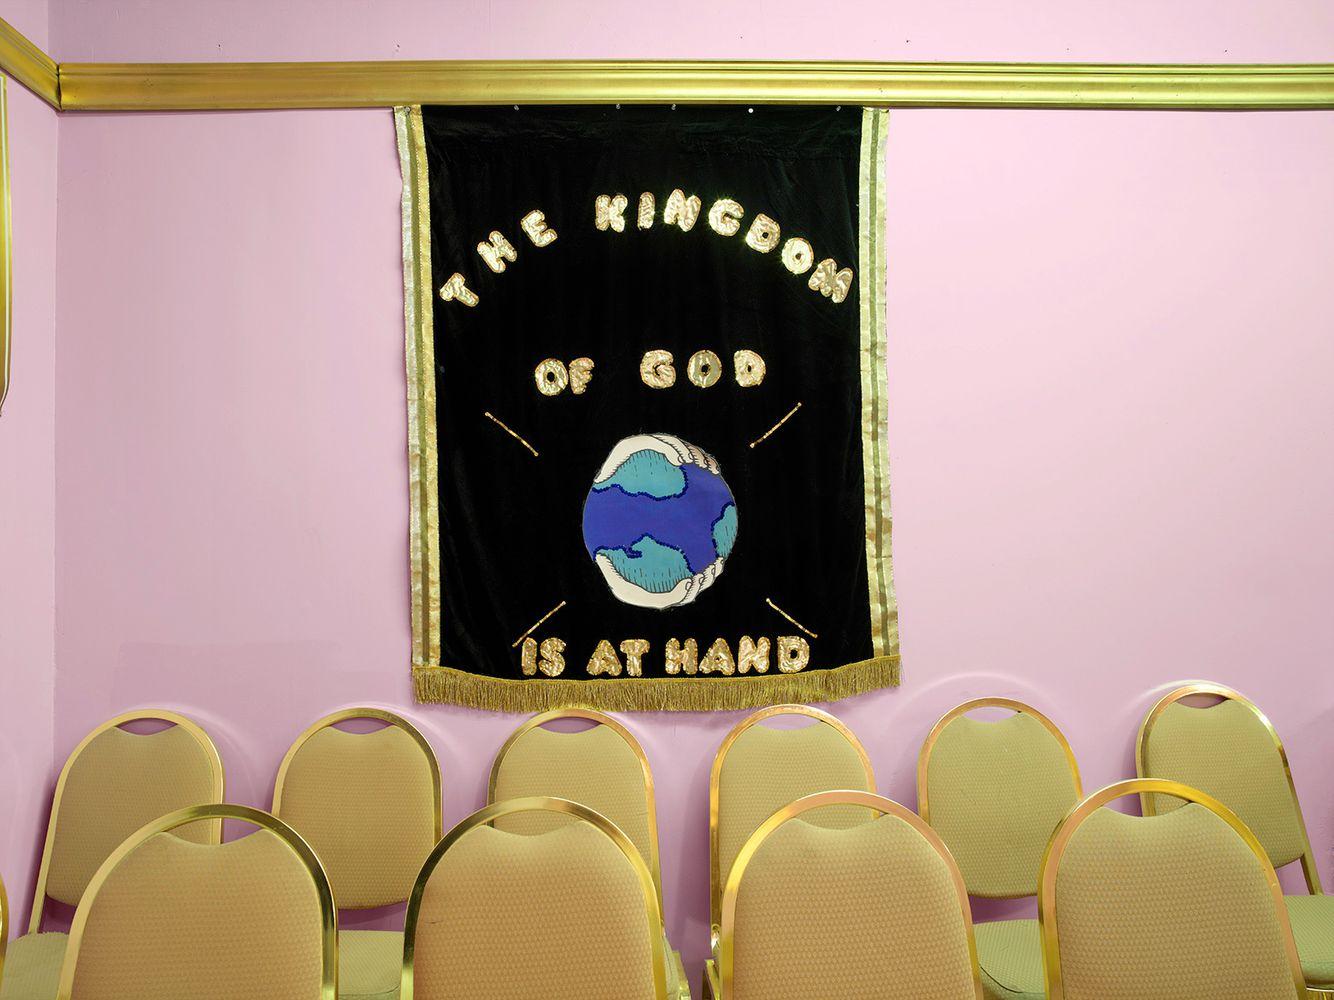 Handmade Banner, New Birth International Outreach Ministries, 6500 S. Morgan, Chicago 2006